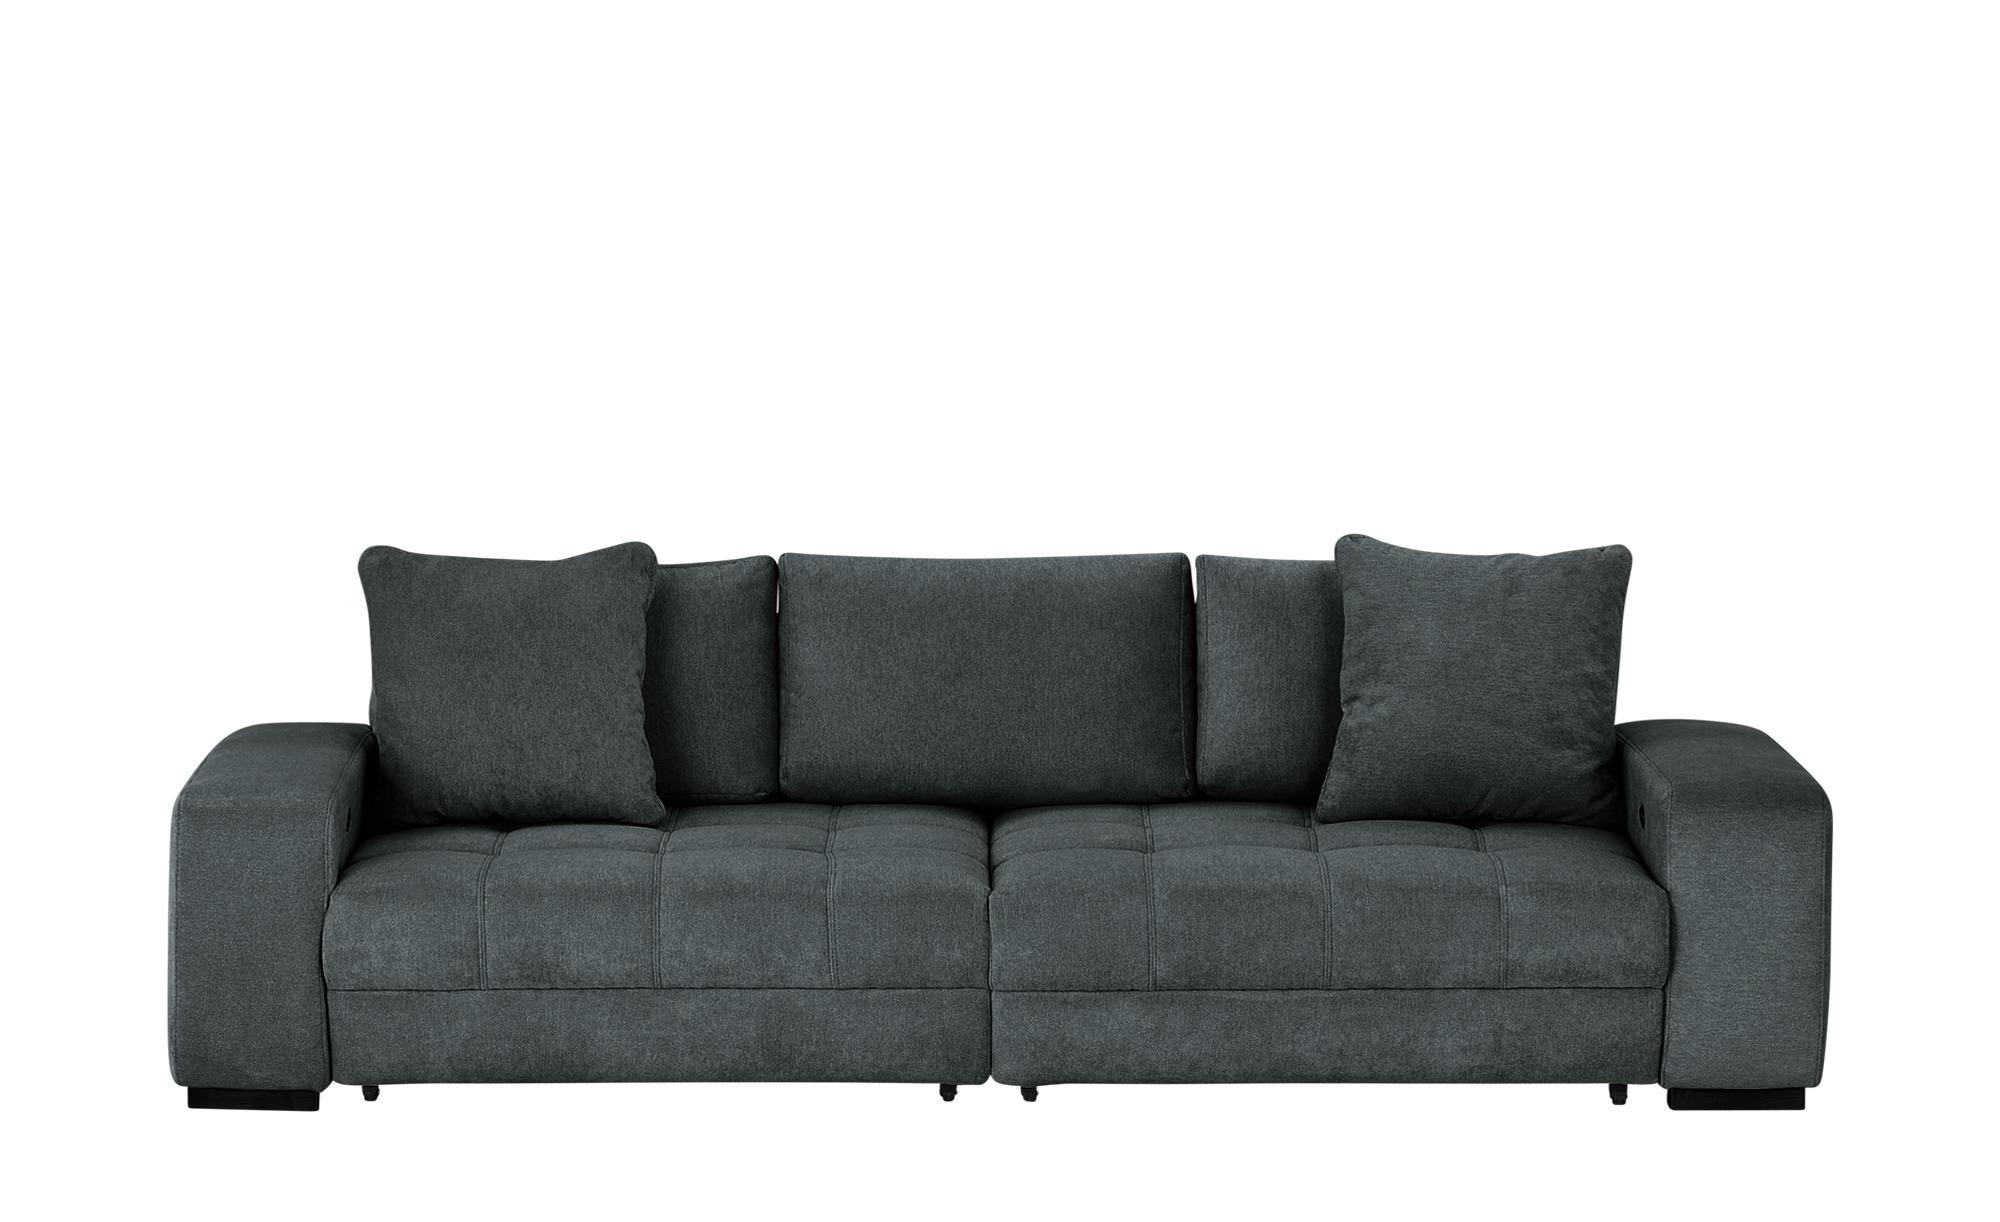 bobb Big Sofa  Caro ¦ schwarz ¦ Maße (cm): B: 302 H: 68 T: 136 Polstermöbel > Sofas > Big-Sofas - Höffner